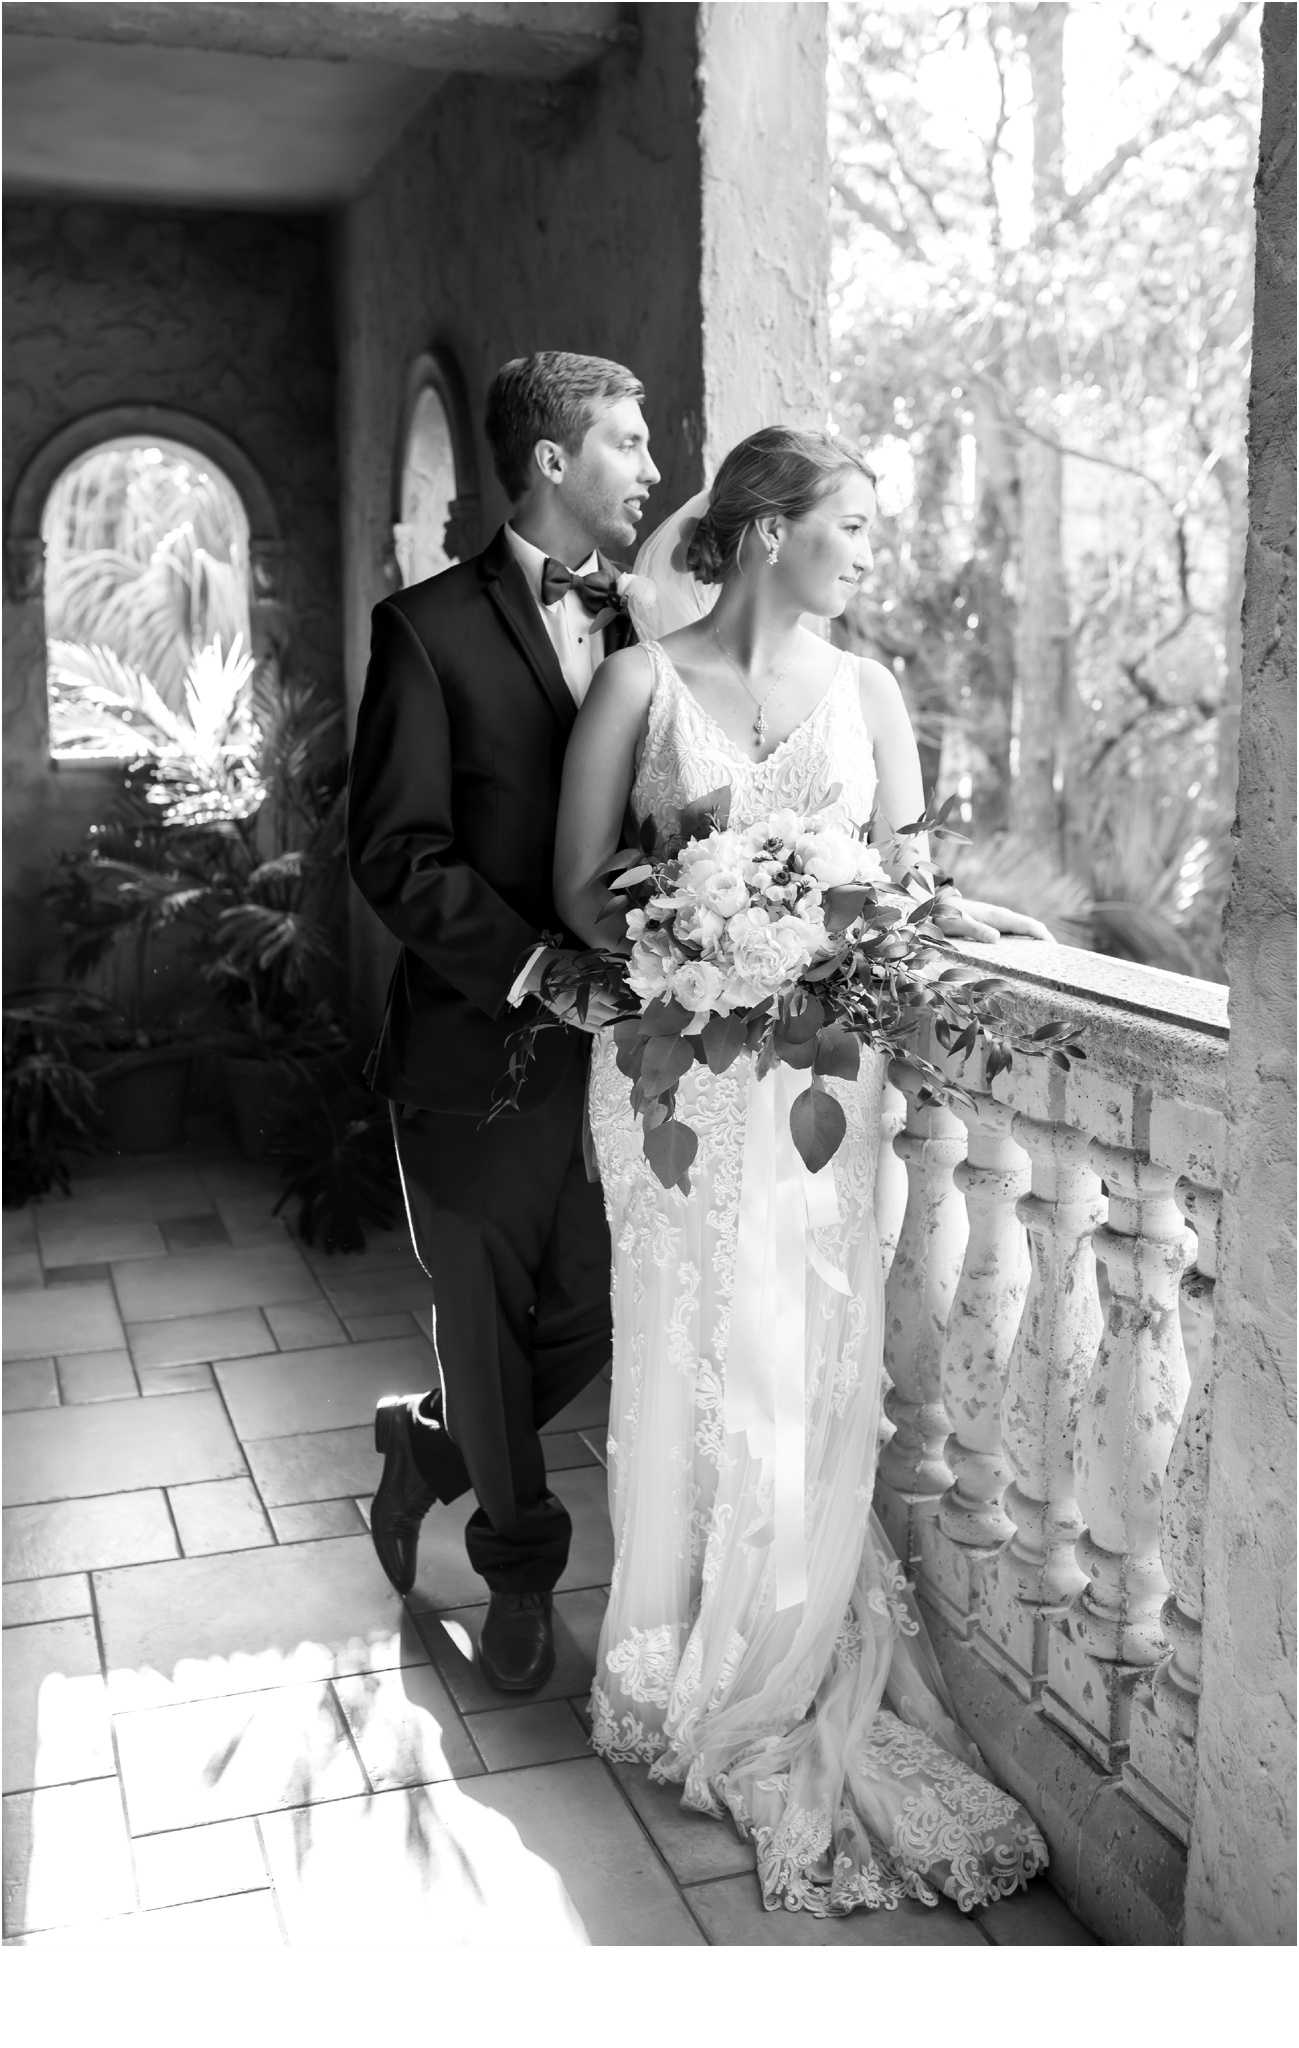 Rainey_Gregg_Photography_St._Simons_Island_Georgia_California_Wedding_Portrait_Photography_0666.jpg